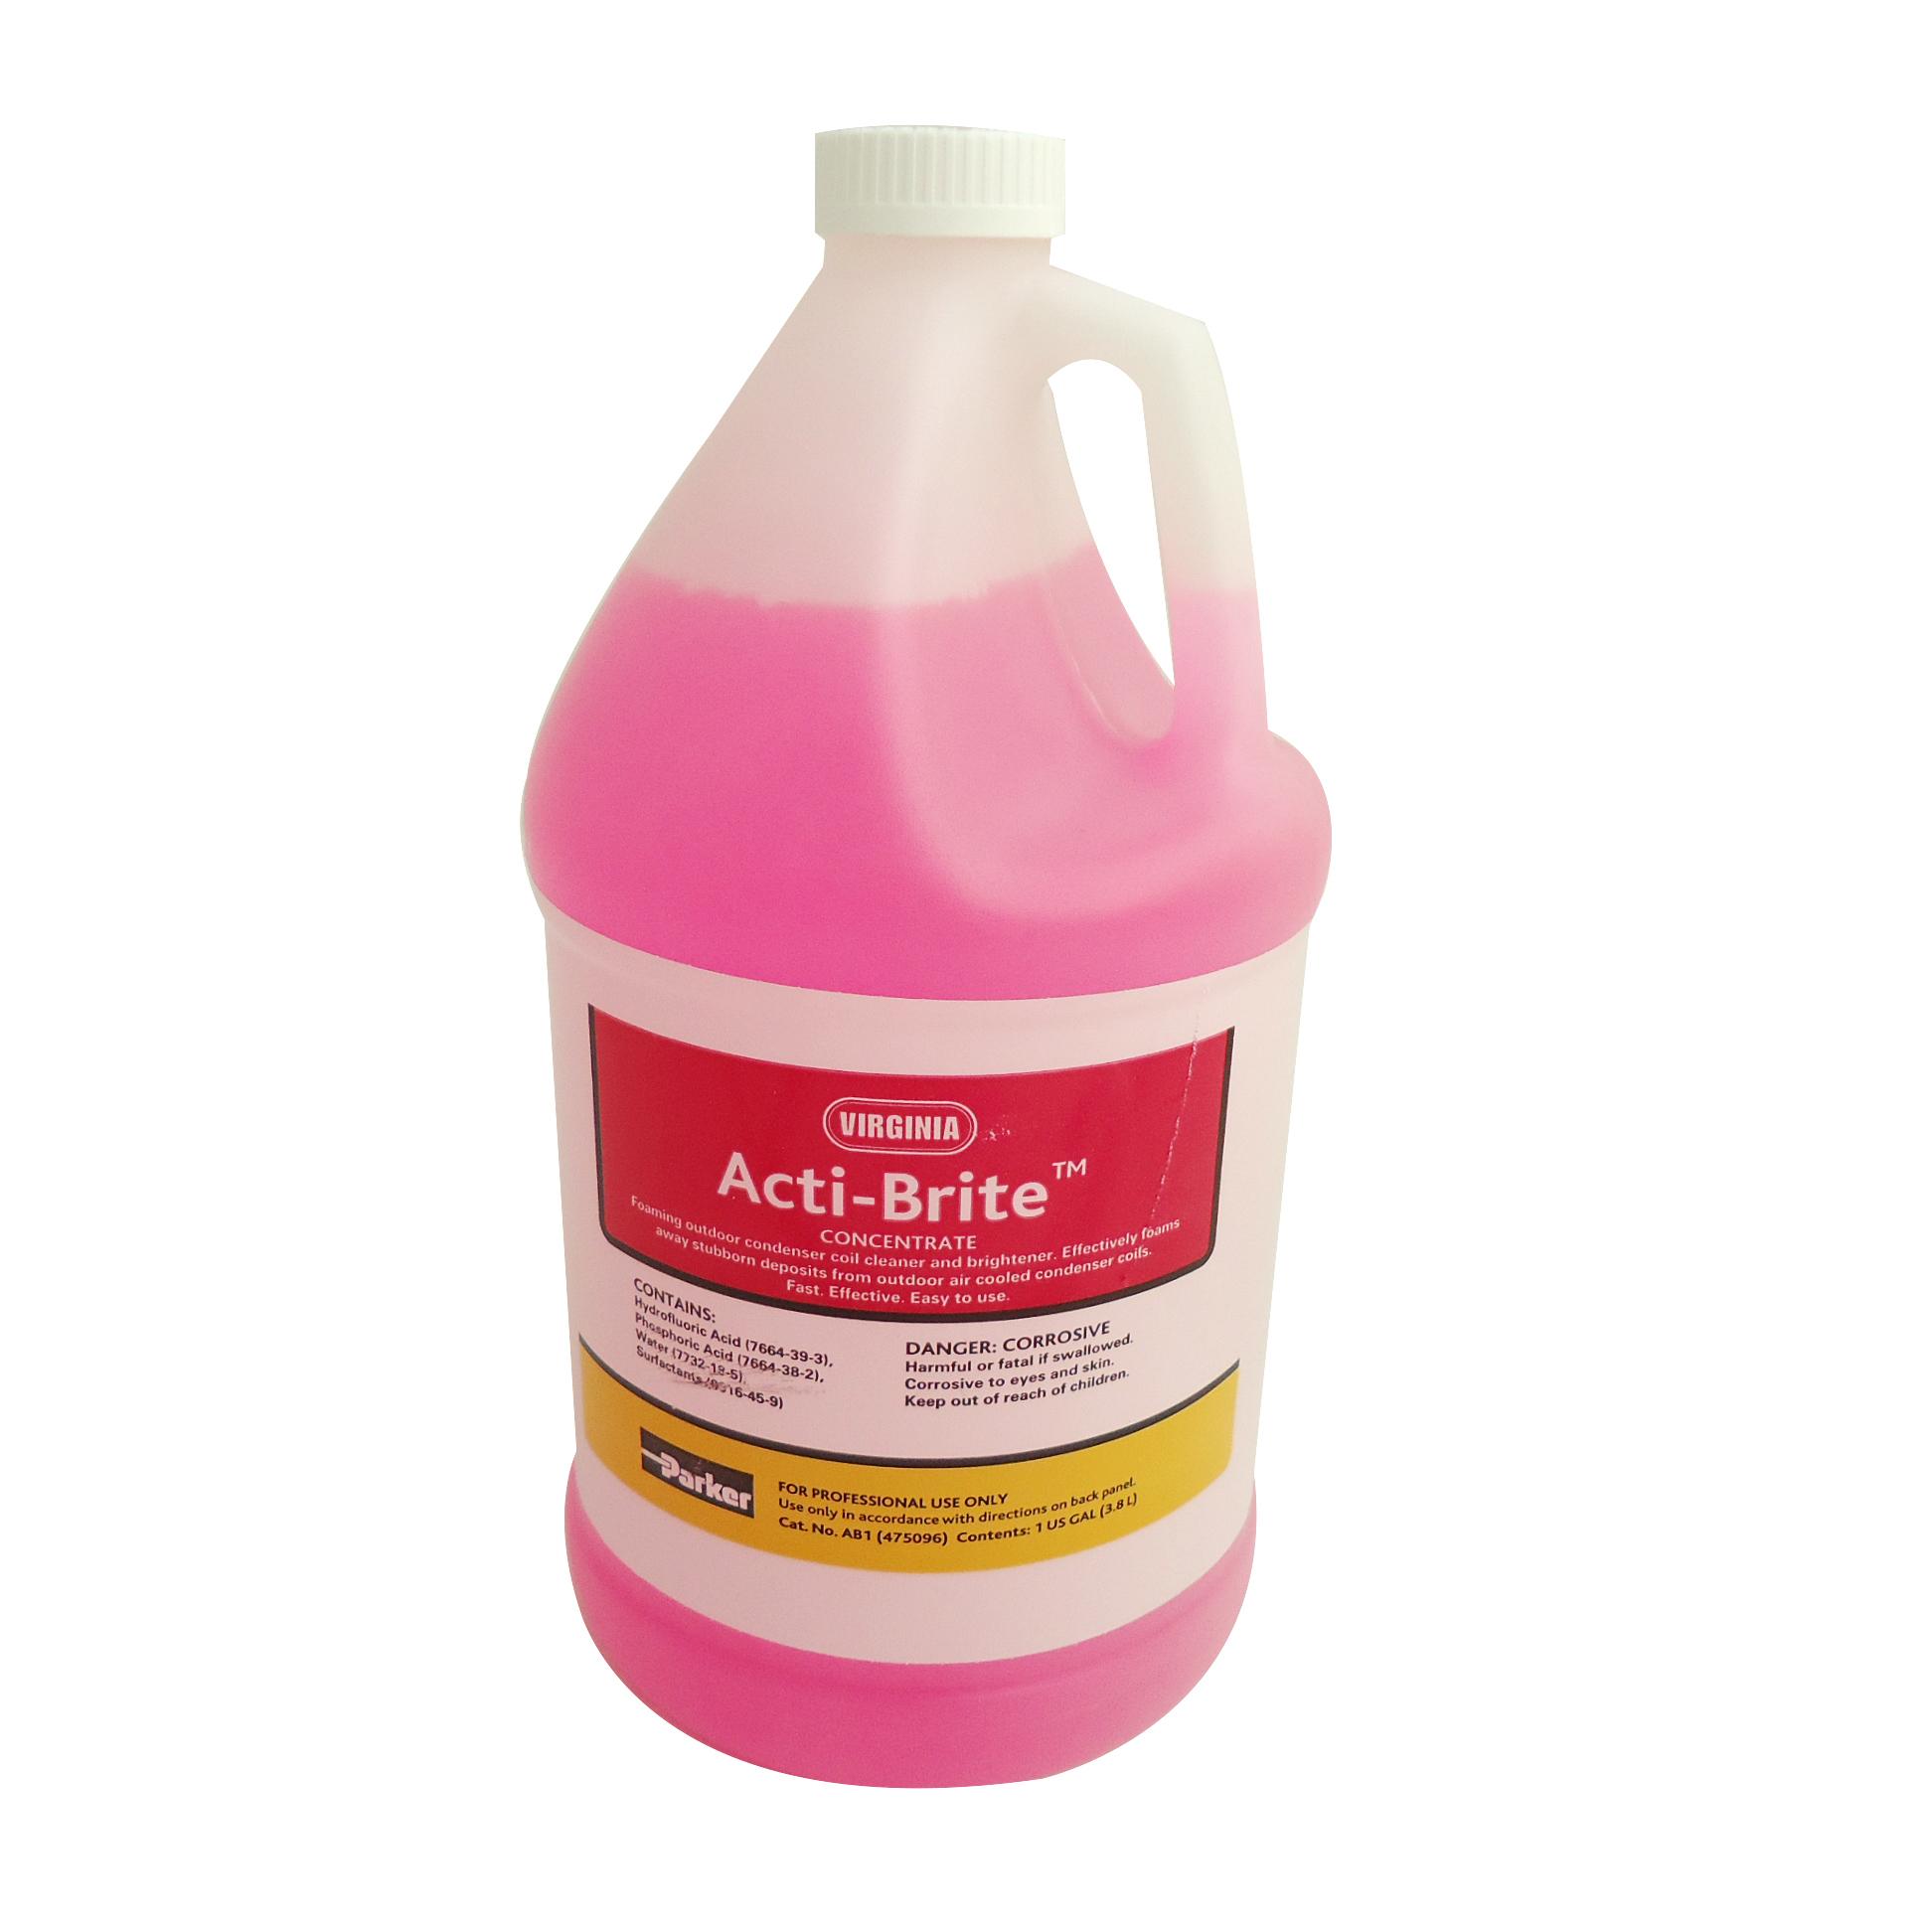 Parker - Virginia Acti Brite AB1 (475096) Καθαριστικό Εξωτερικής Χρήσης Για Κλιμ κλιματισμός    καθαριστικά κλιματιστικών a c  προσφορές   κλιματισμός υλικά εγκα